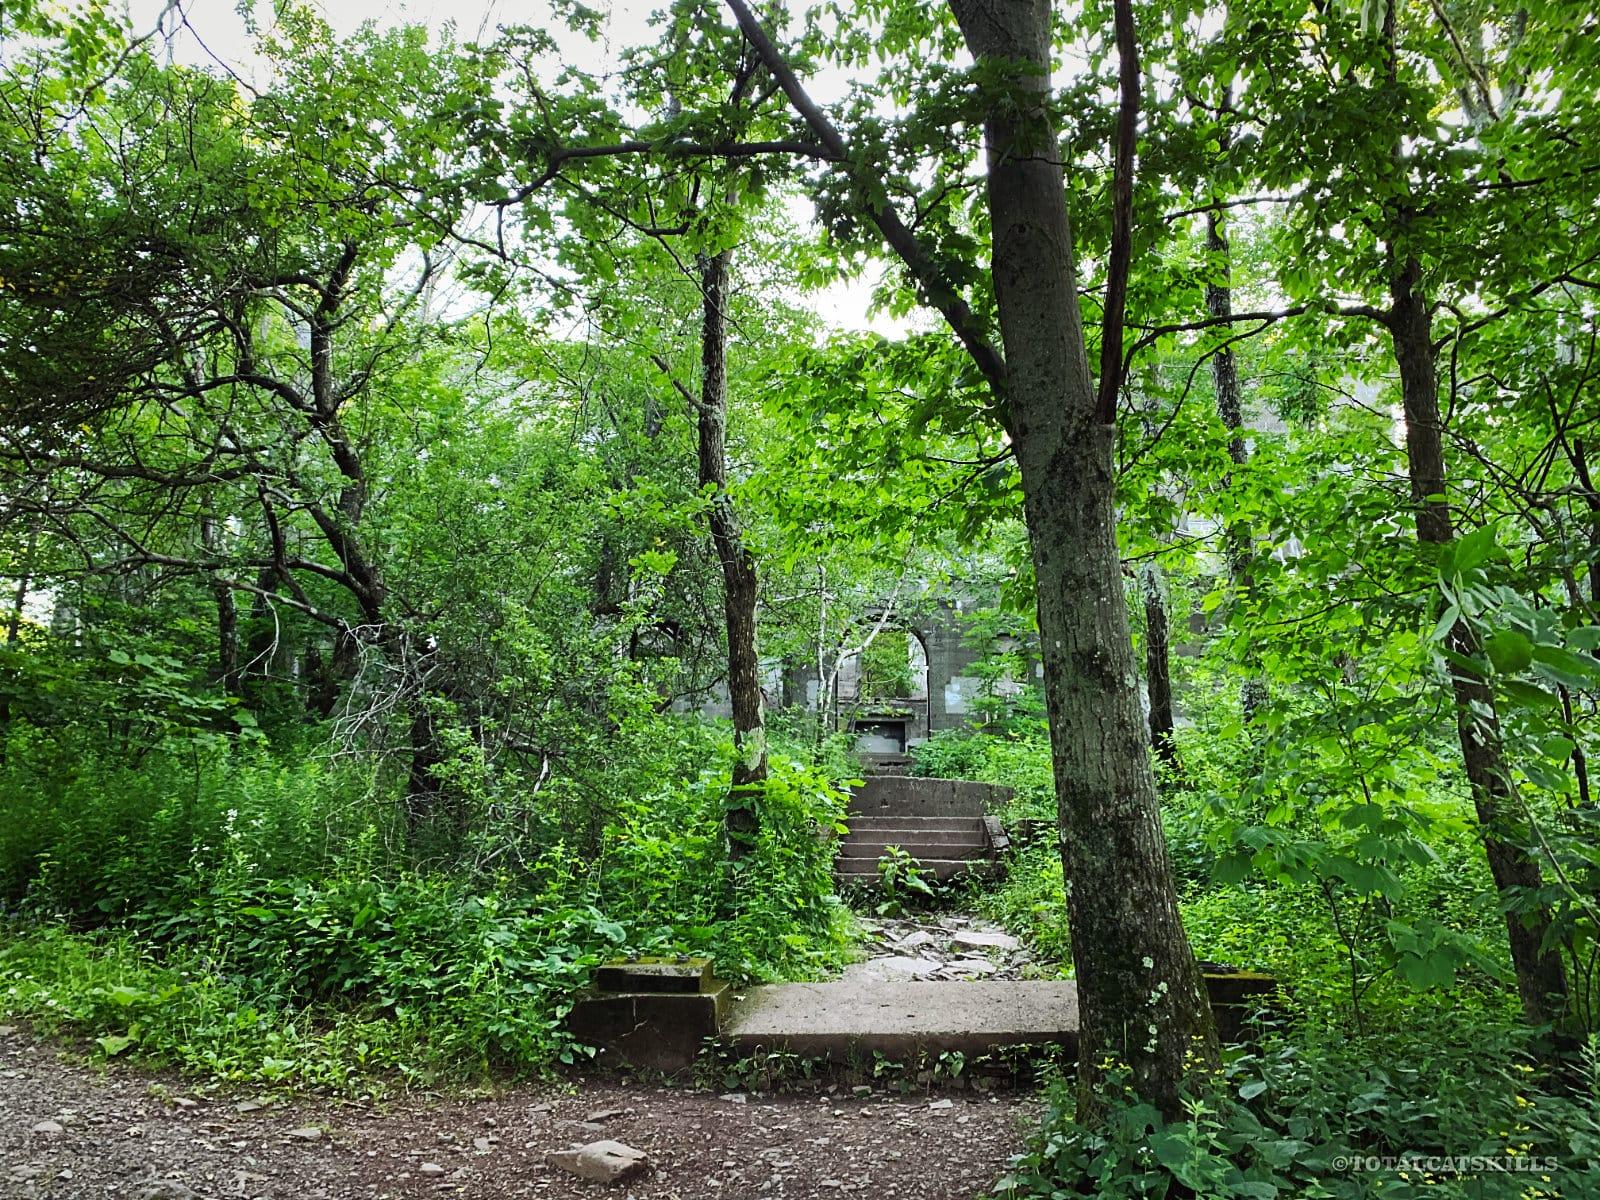 entrance to overlook mountainn house ruins